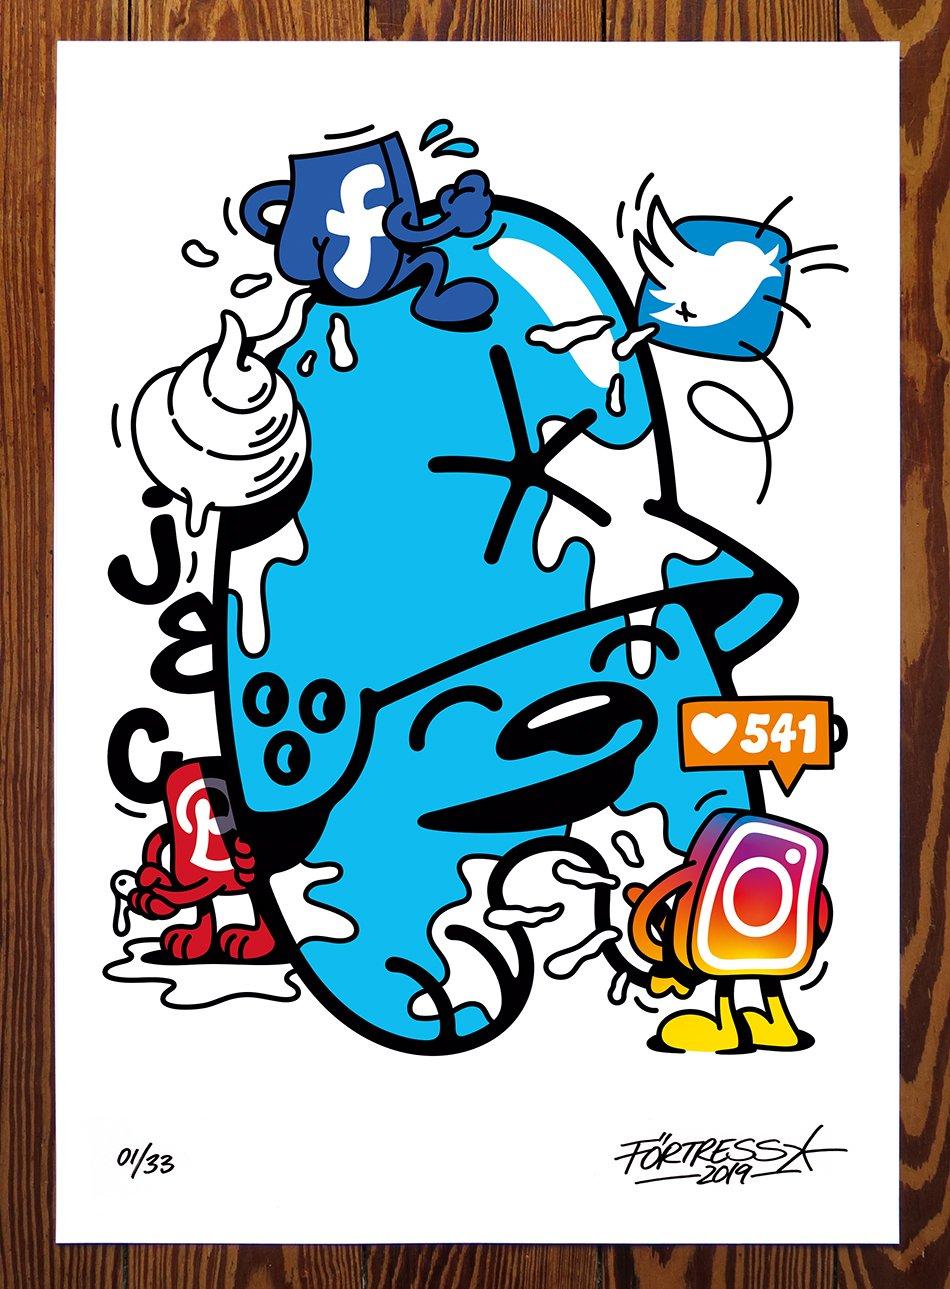 https://assets.bigcartel.com/product_images/237065921/PRINT-Socialmediabukakke-01.jpg?auto=format&fit=max&h=1000&w=1000